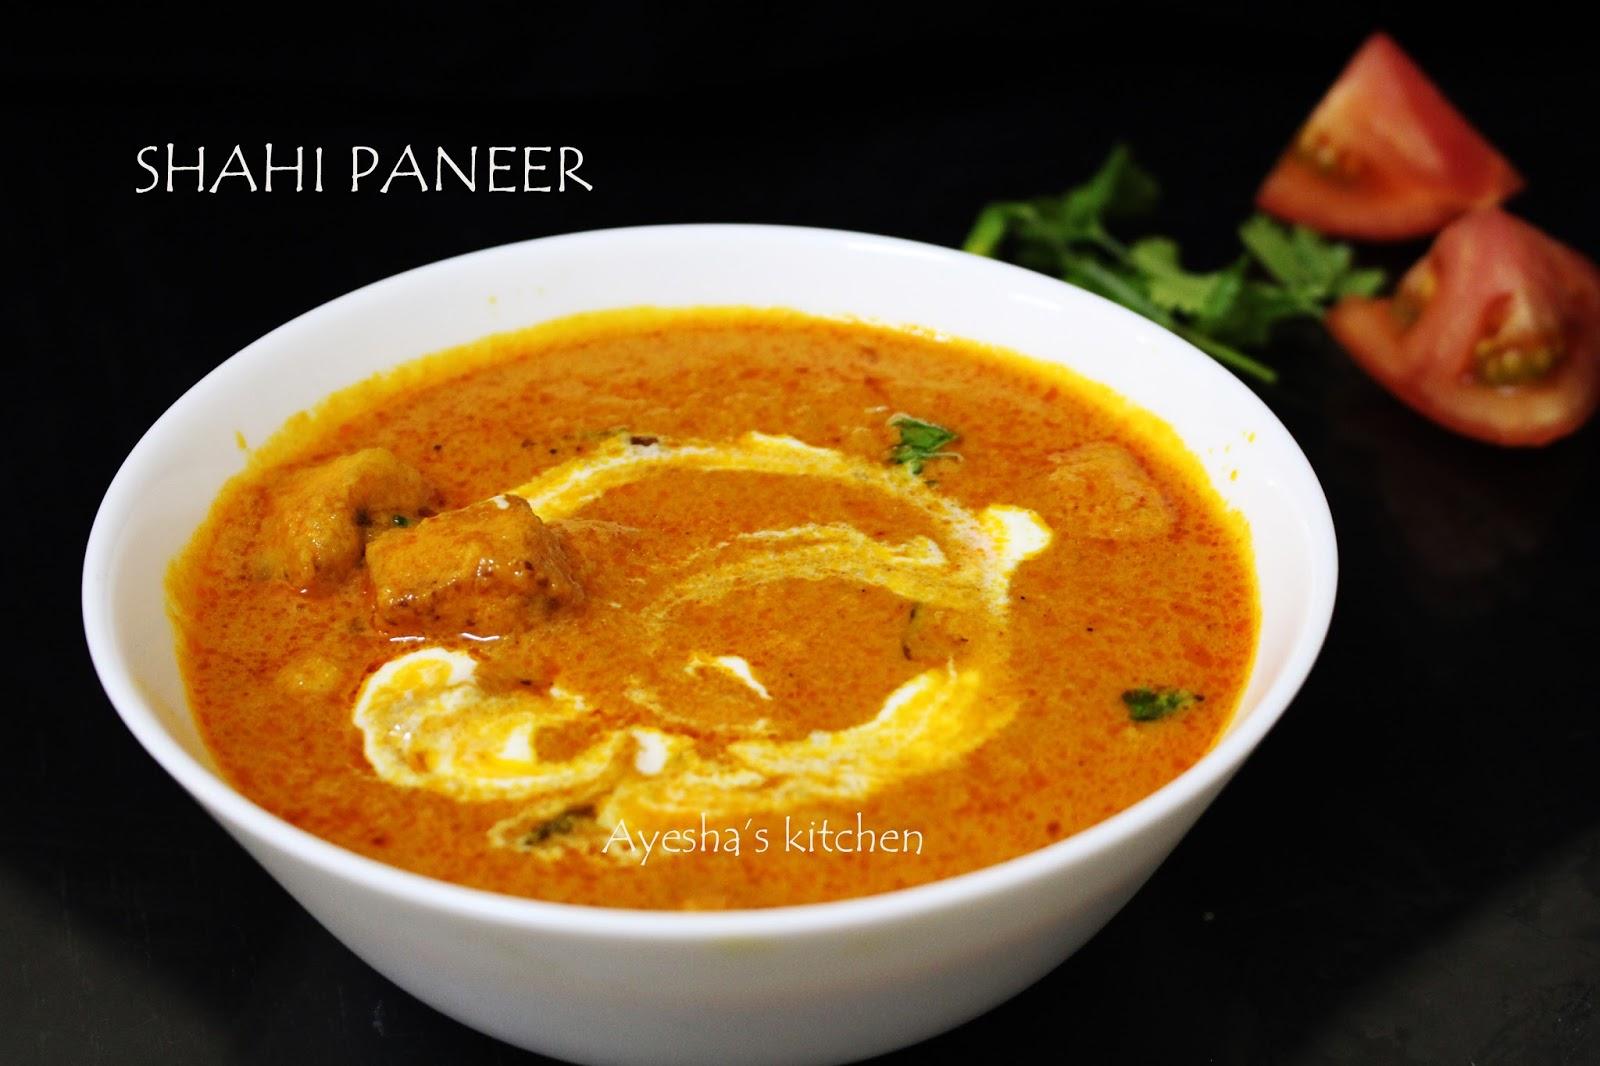 Shahi paneer recipe how to make shahi paneer yummy creamy paneer recipe taste awesome and flavorful like paneer tikka masala forumfinder Gallery